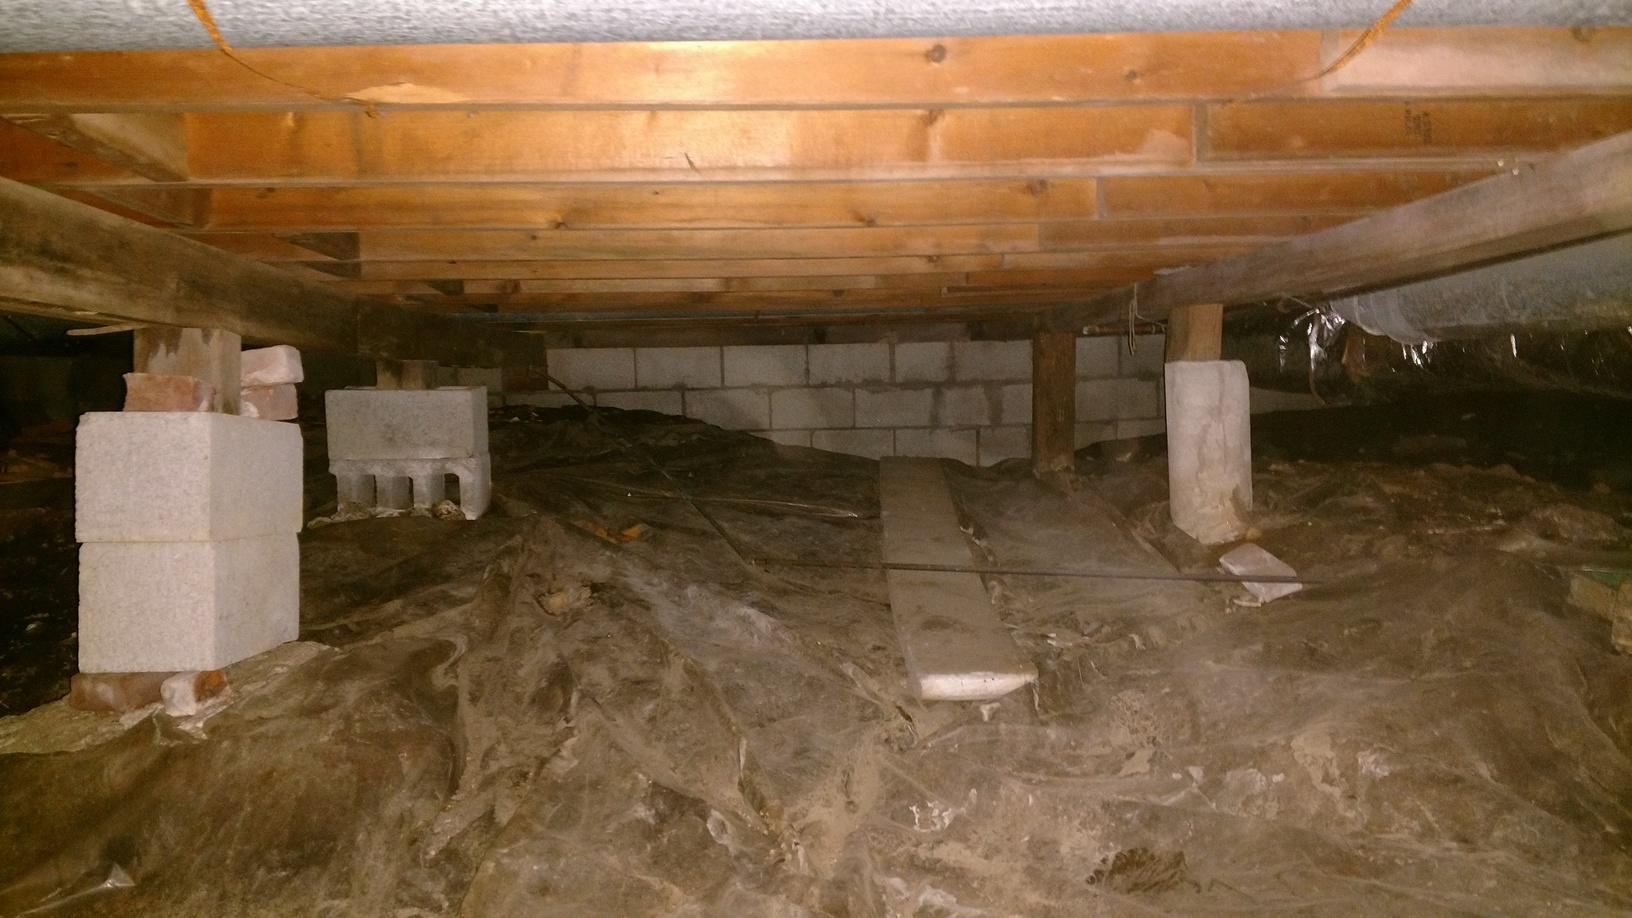 Dirty Crawlspace